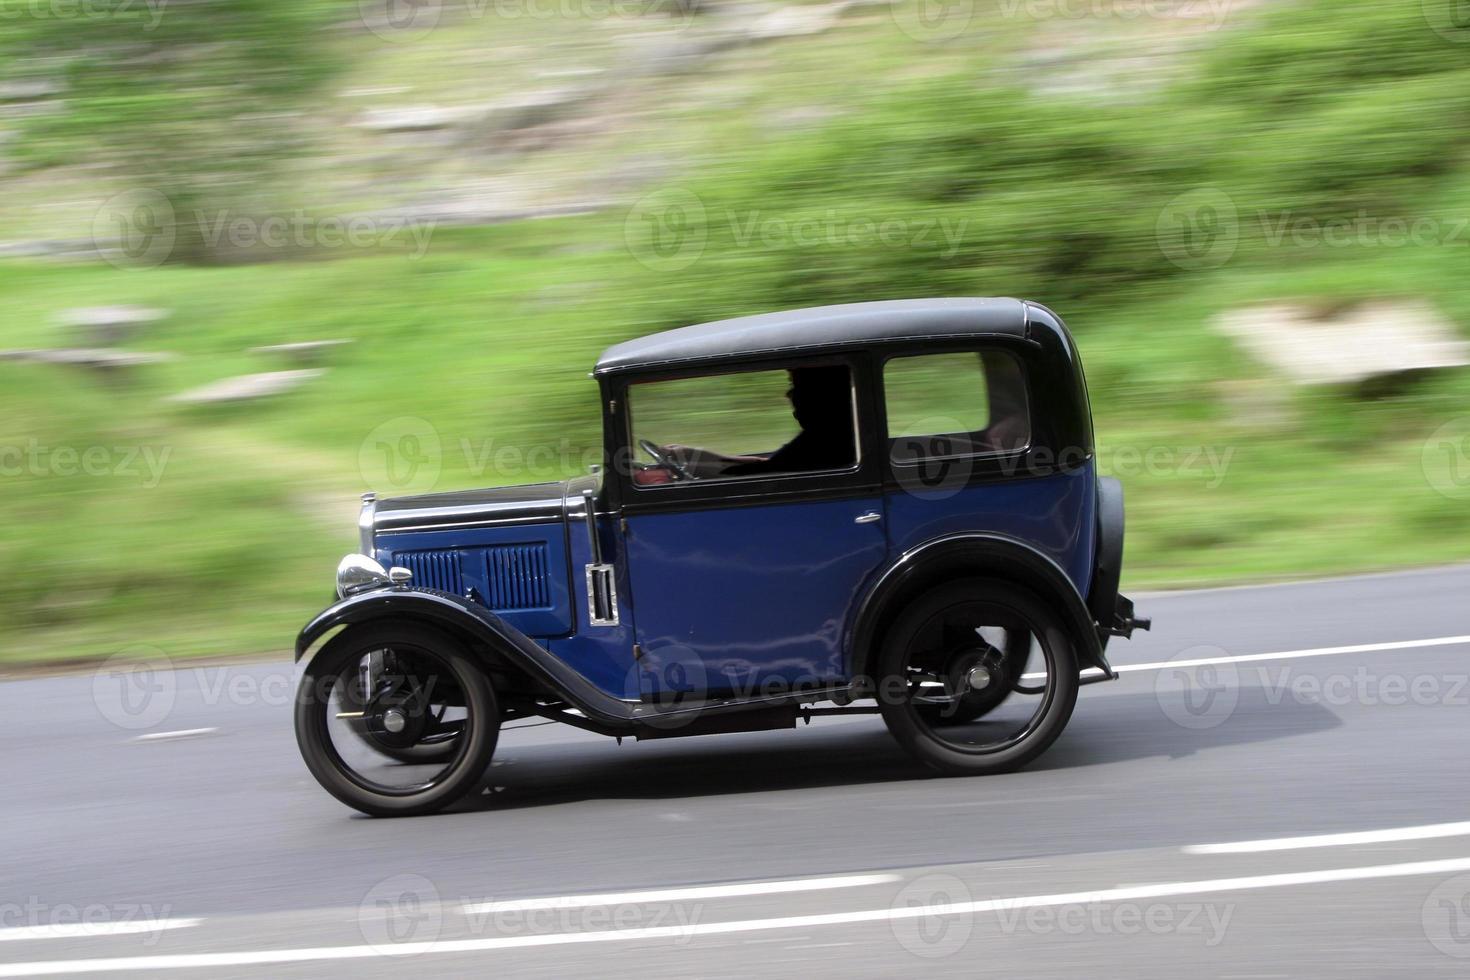 gammal bil i hastighet foto